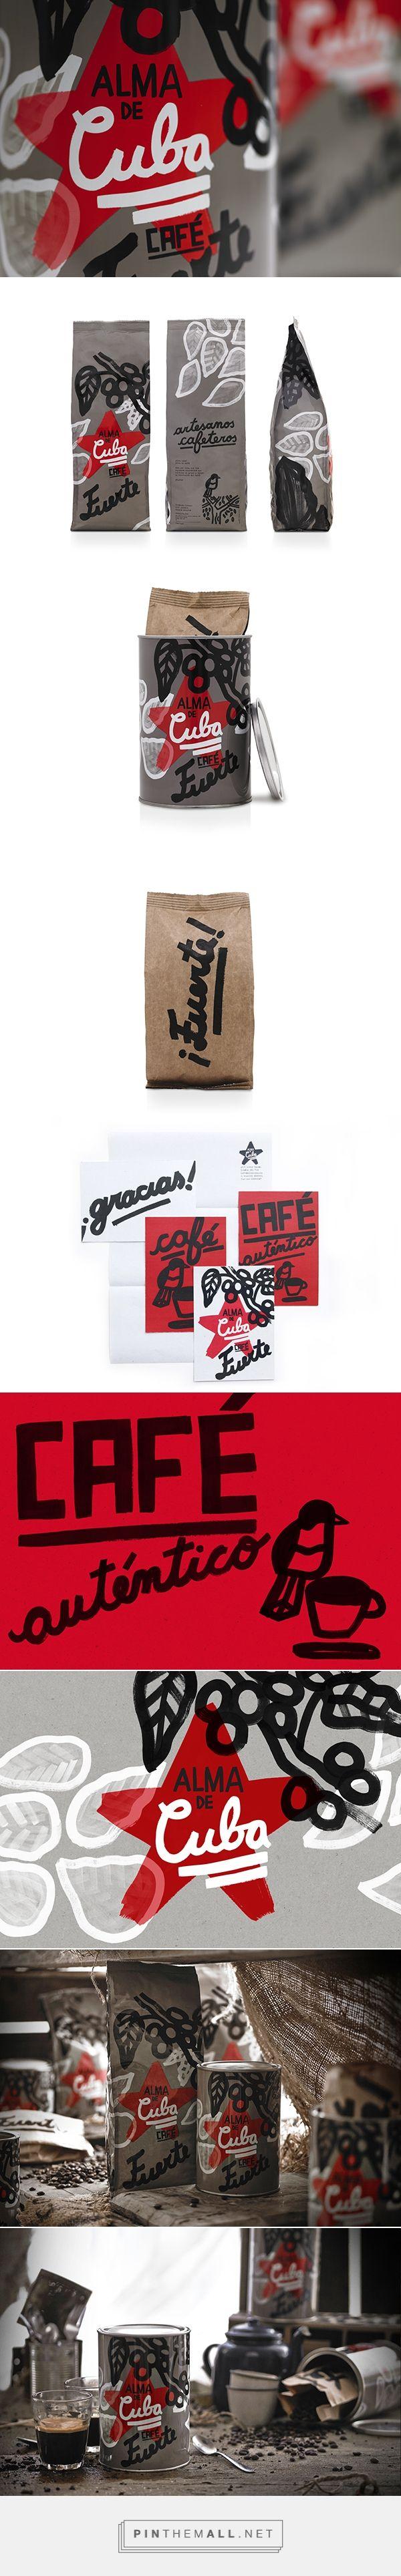 Alma De Cuba Brand Coffee Packaging by Big Fish | Fivestar Branding – Design and Branding Agency & Inspiration Gallery